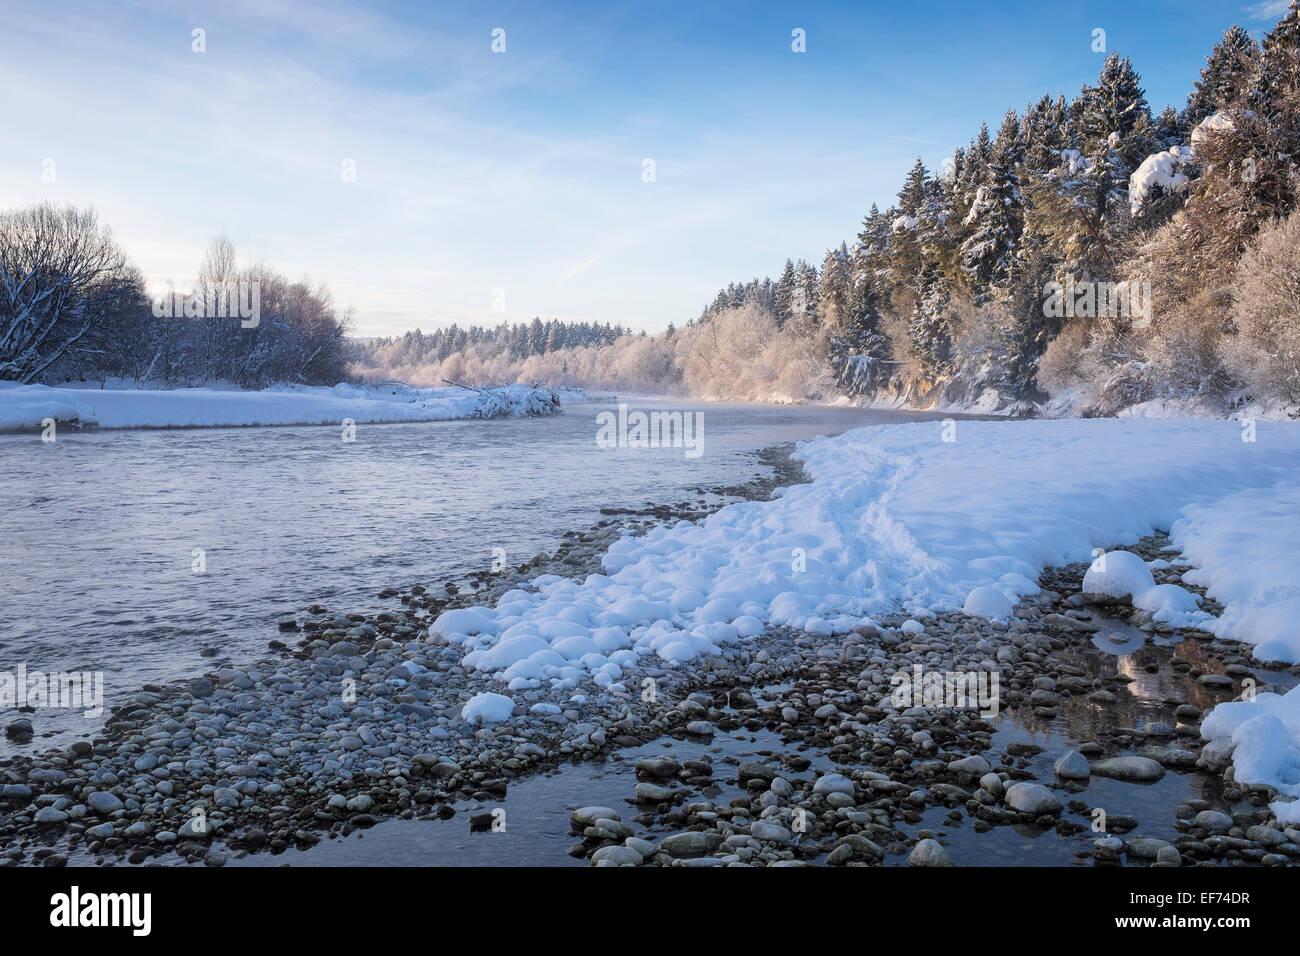 Isar river in the winter, Pupplinger Au, Geretsried, Upper Bavaria, Bavaria, Germany - Stock Image